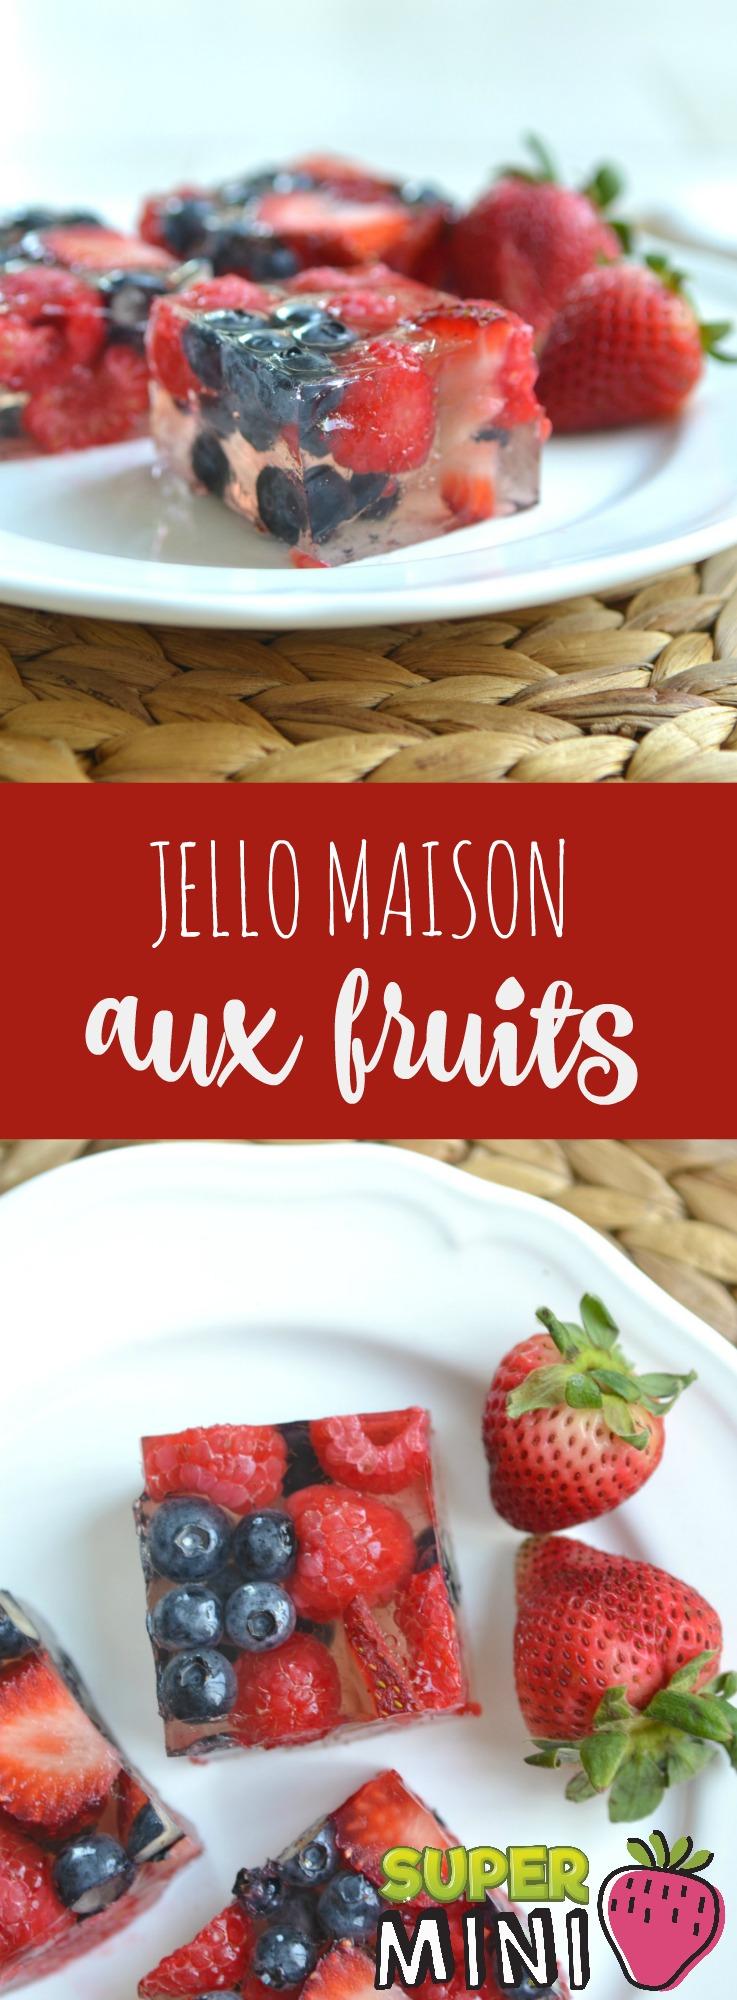 Jello-maison-petits-fruits_wooloo